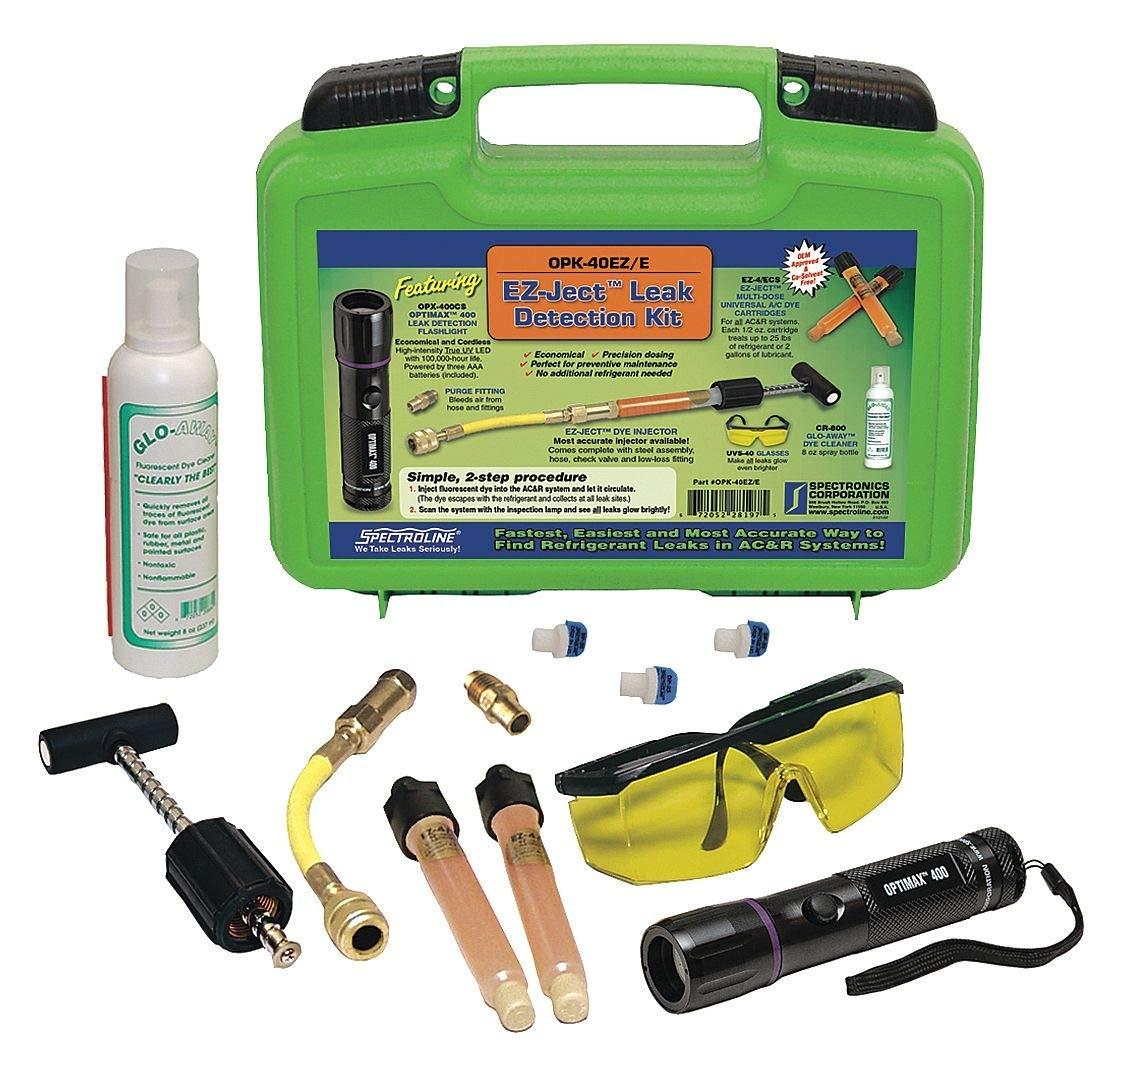 Spectroline Leak Detection Kit, Multi-Dose, (3) AAA